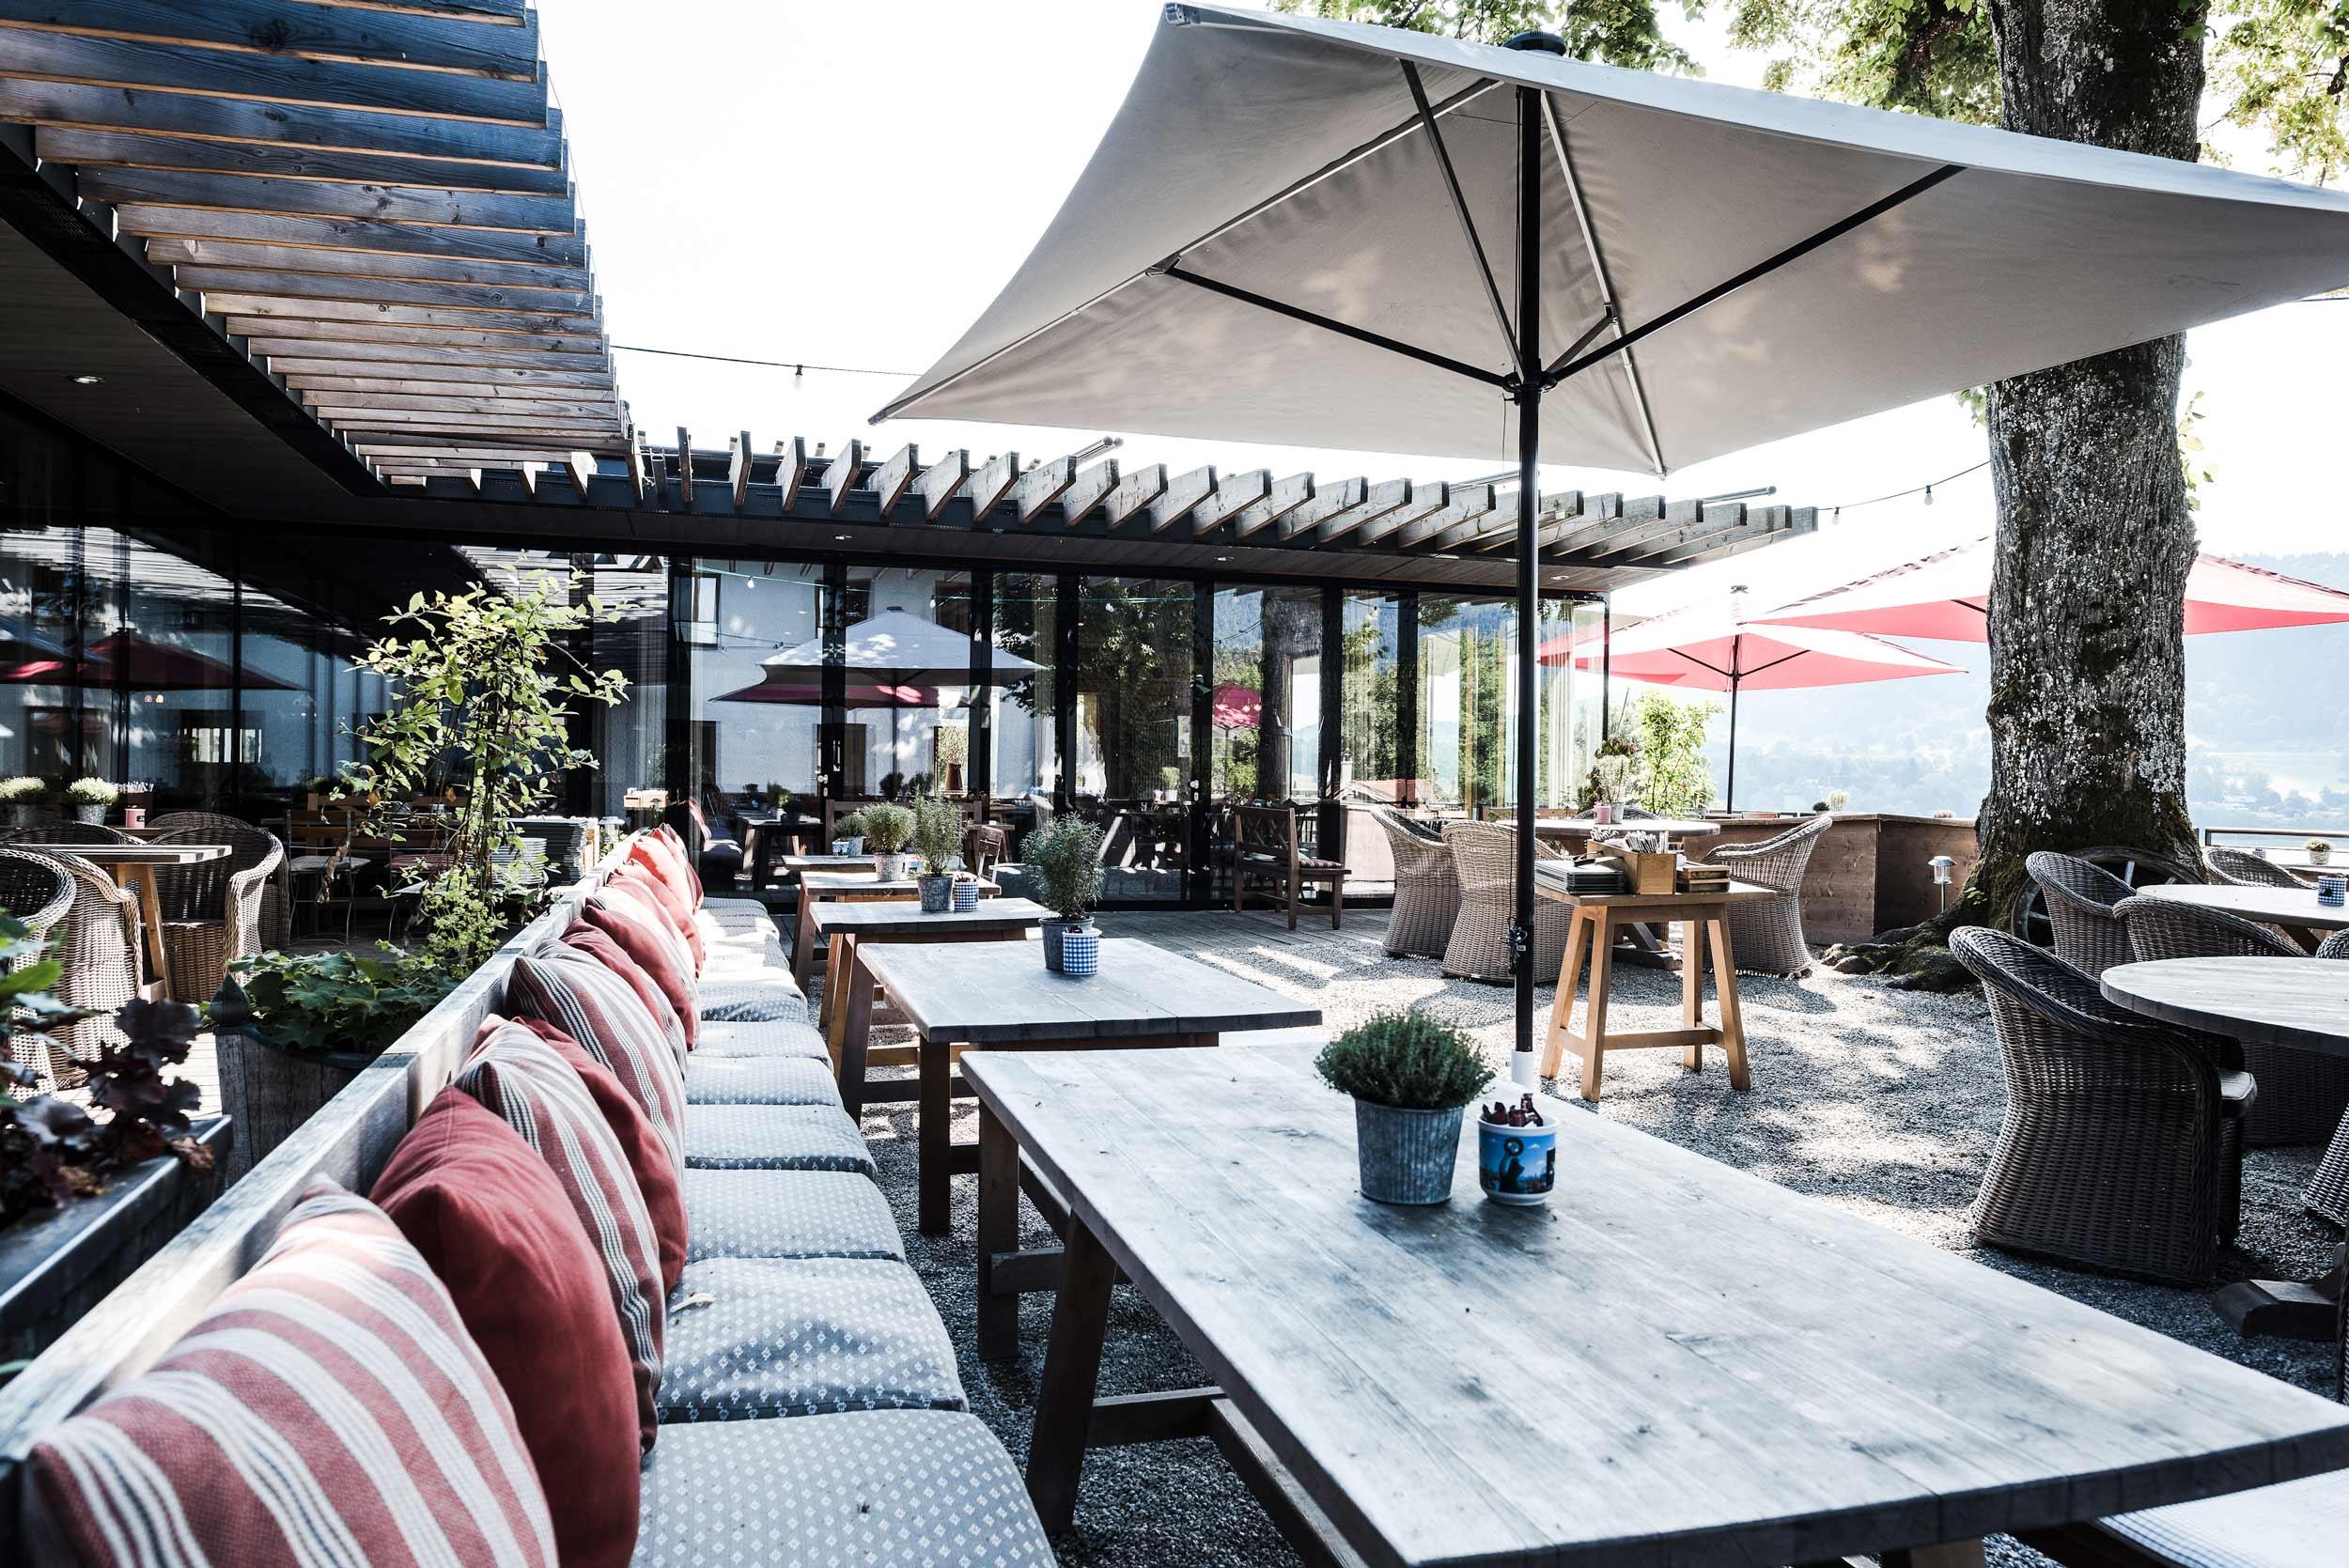 zimmerei-stoib-holzbau-holzhaus-gut-kaltenbrunn-tegernsee-festsaal-restaurant-fassade-sanierung-käfer-biergarten-terrasse-20.jpg